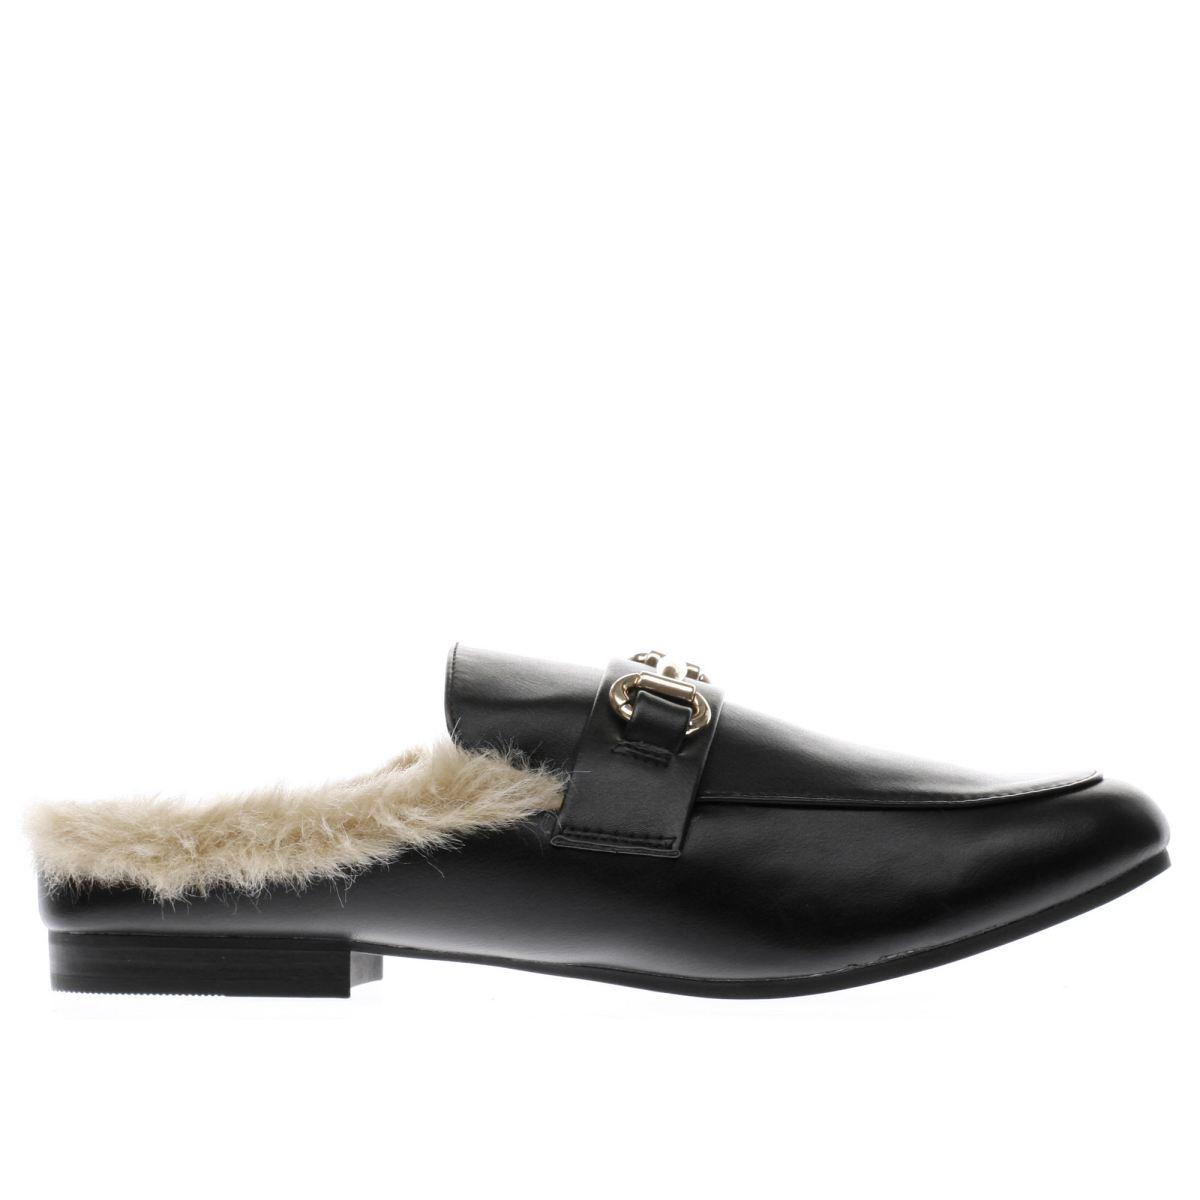 schuh black posh flat shoes